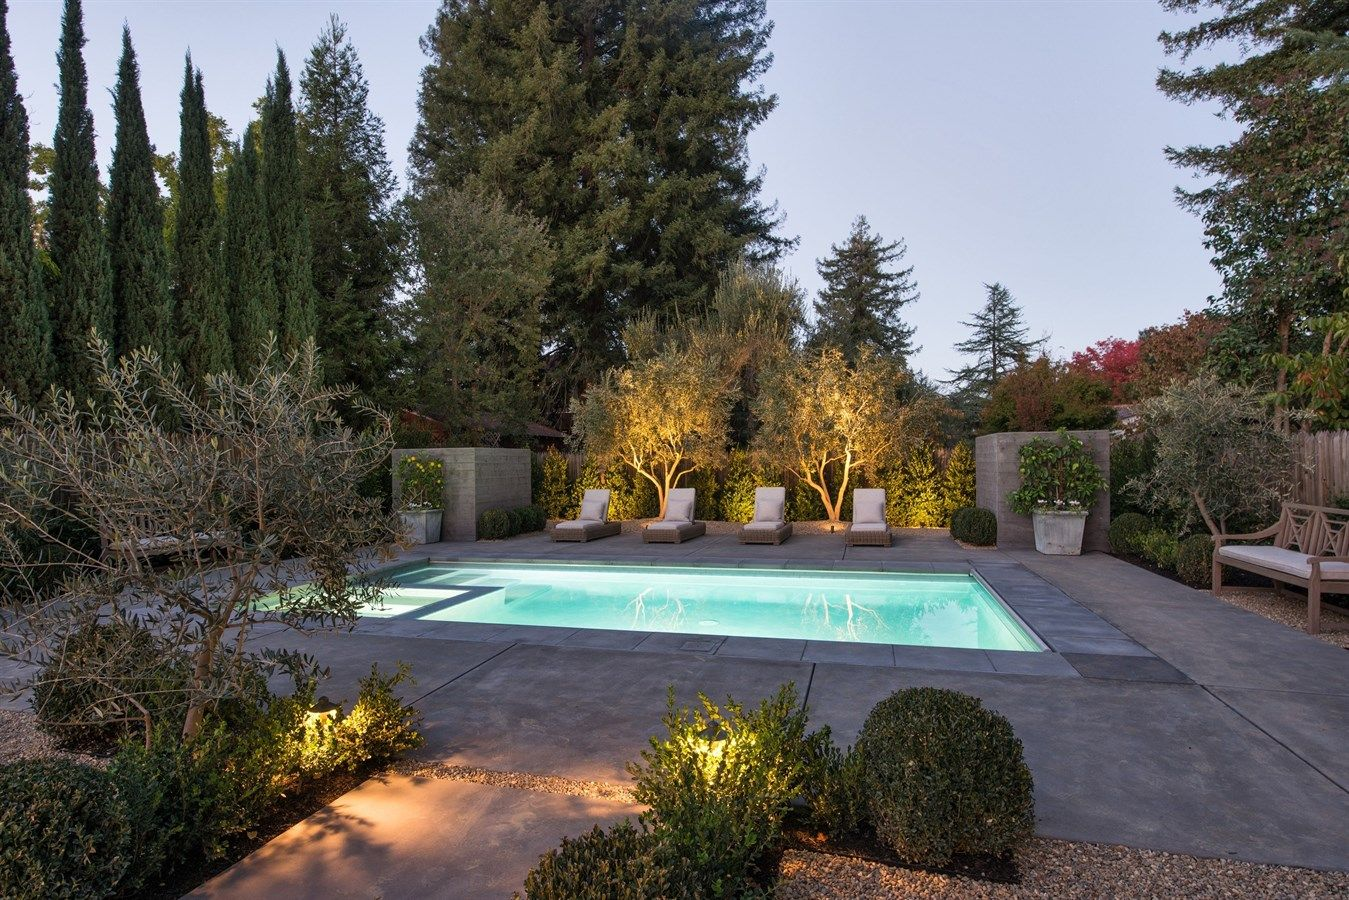 Simple Low Maintenance Pool Backyard Pool Landscaping Pool Landscaping Pool Landscape Design